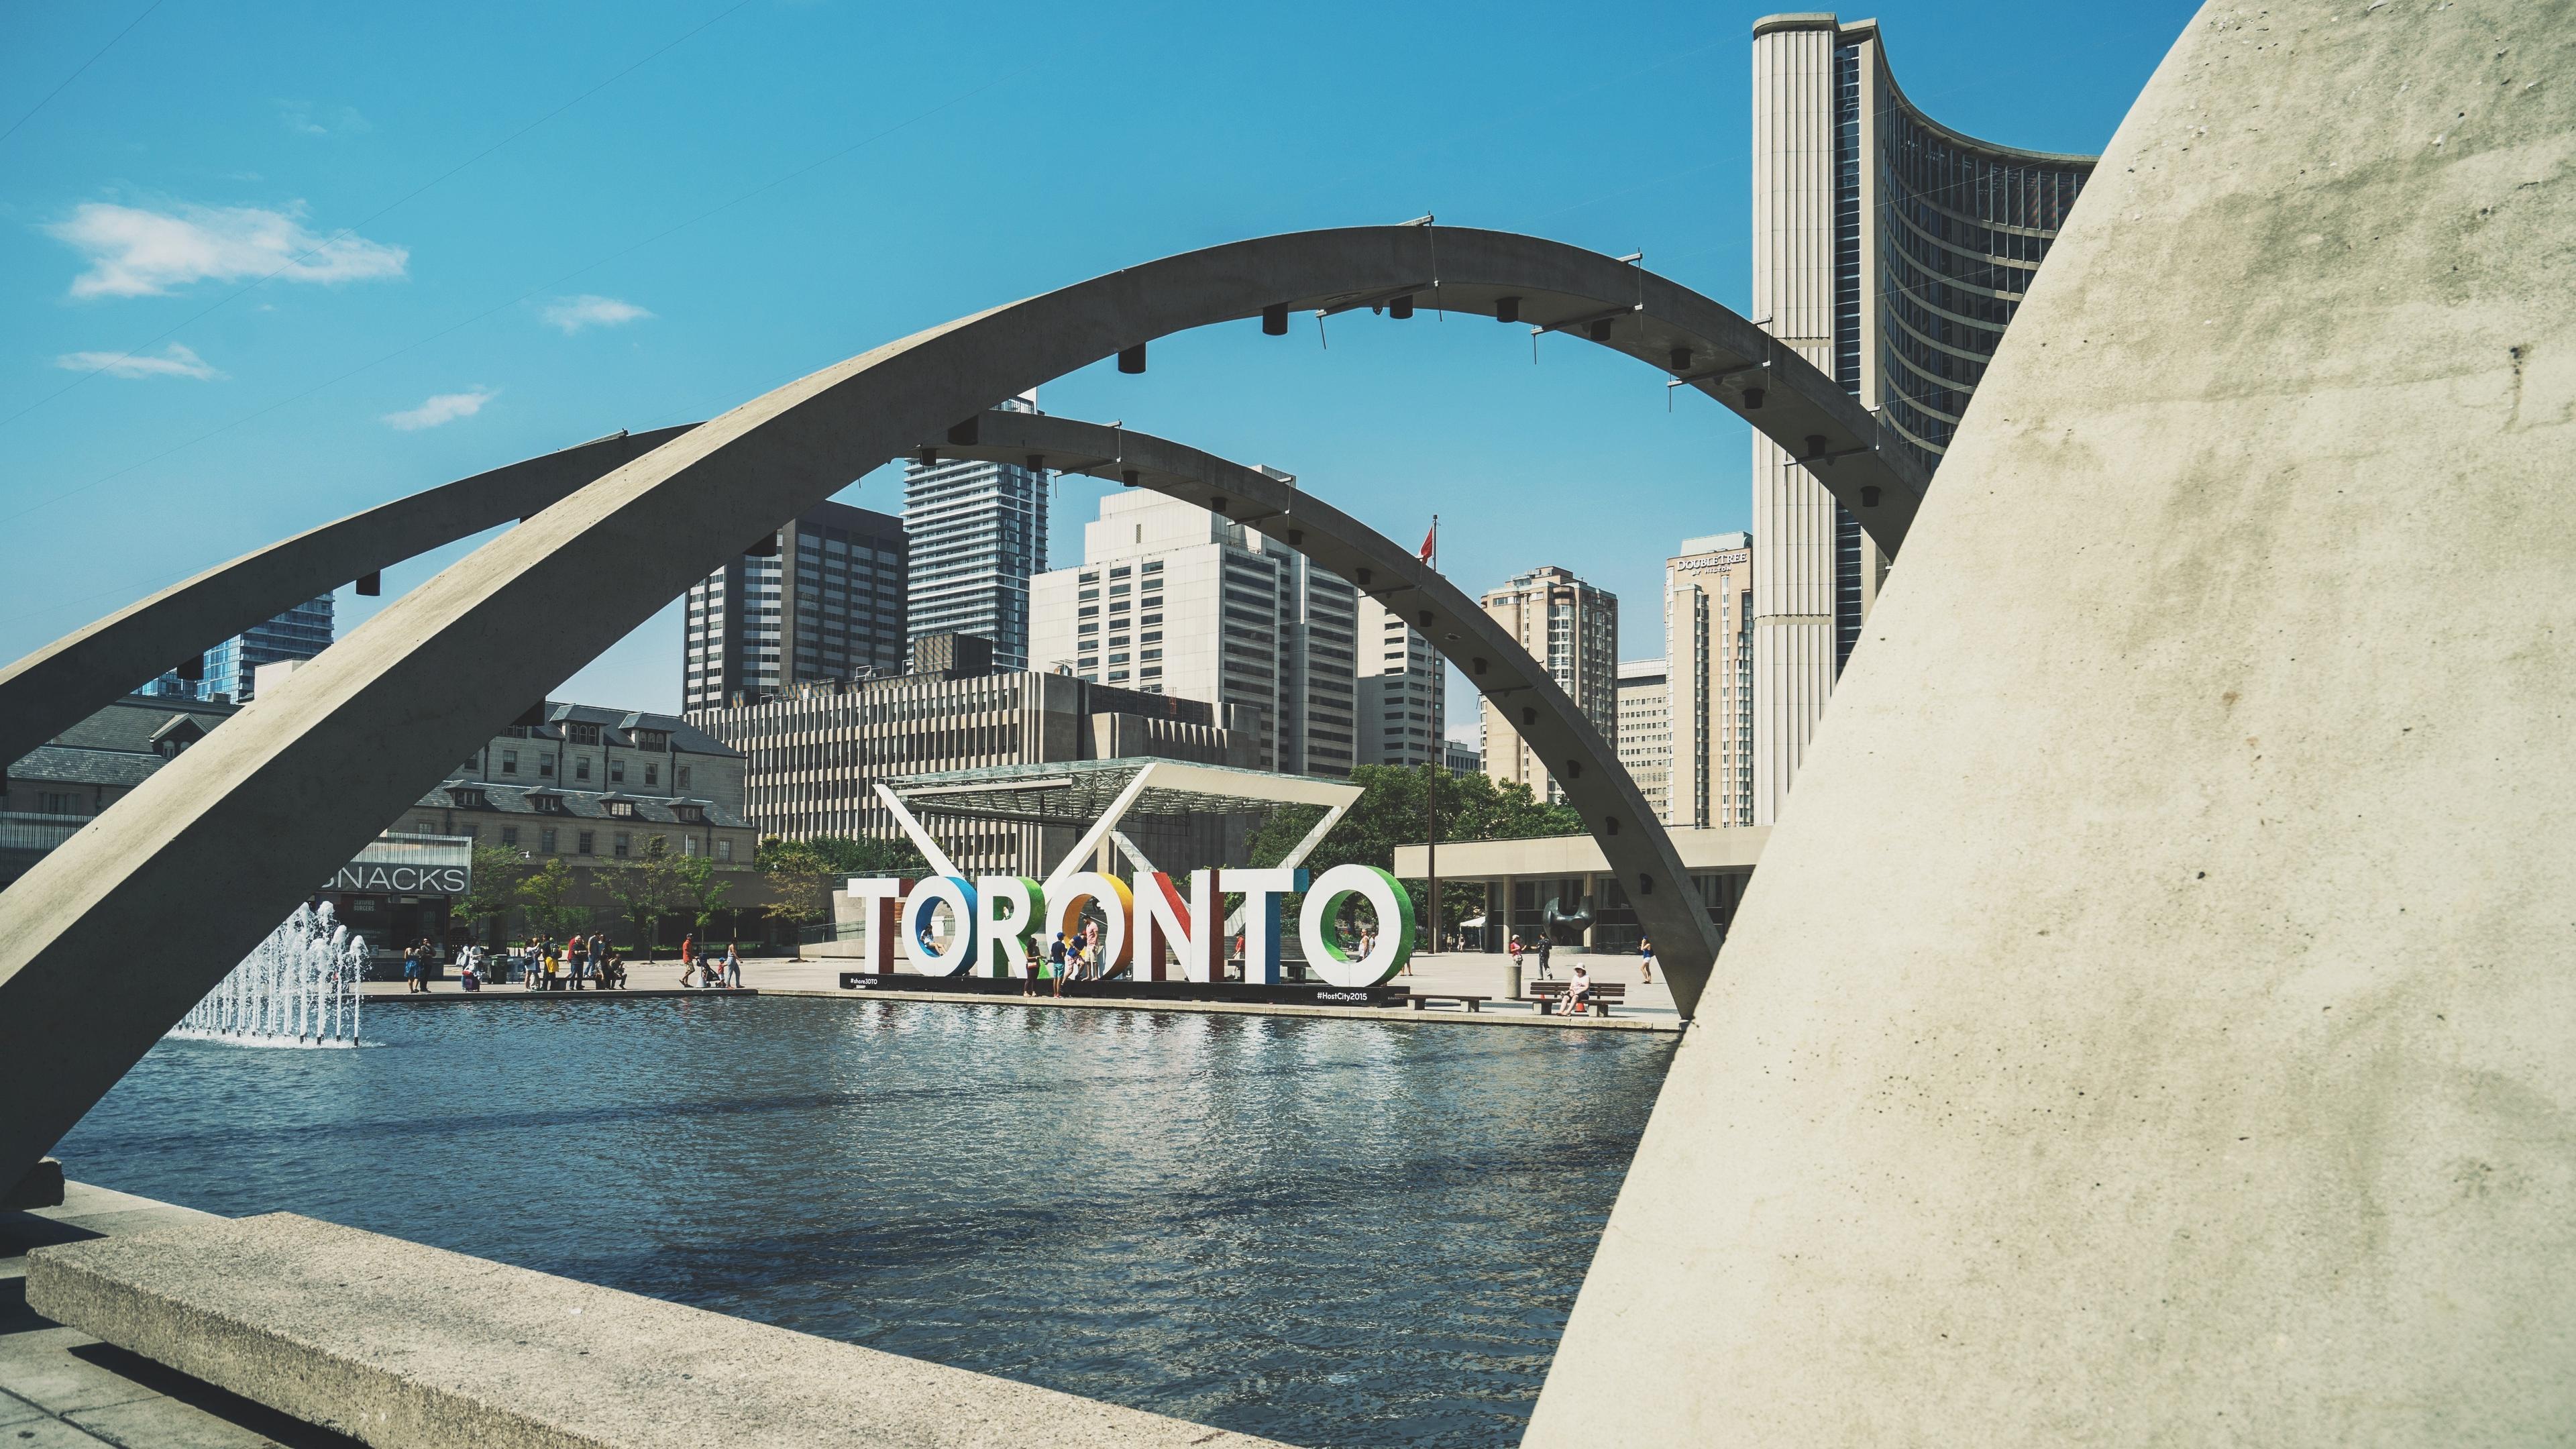 toronto canada ontario administration architecture 4k 1538068843 - toronto, canada, ontario, administration, architecture 4k - Toronto, ontario, Canada